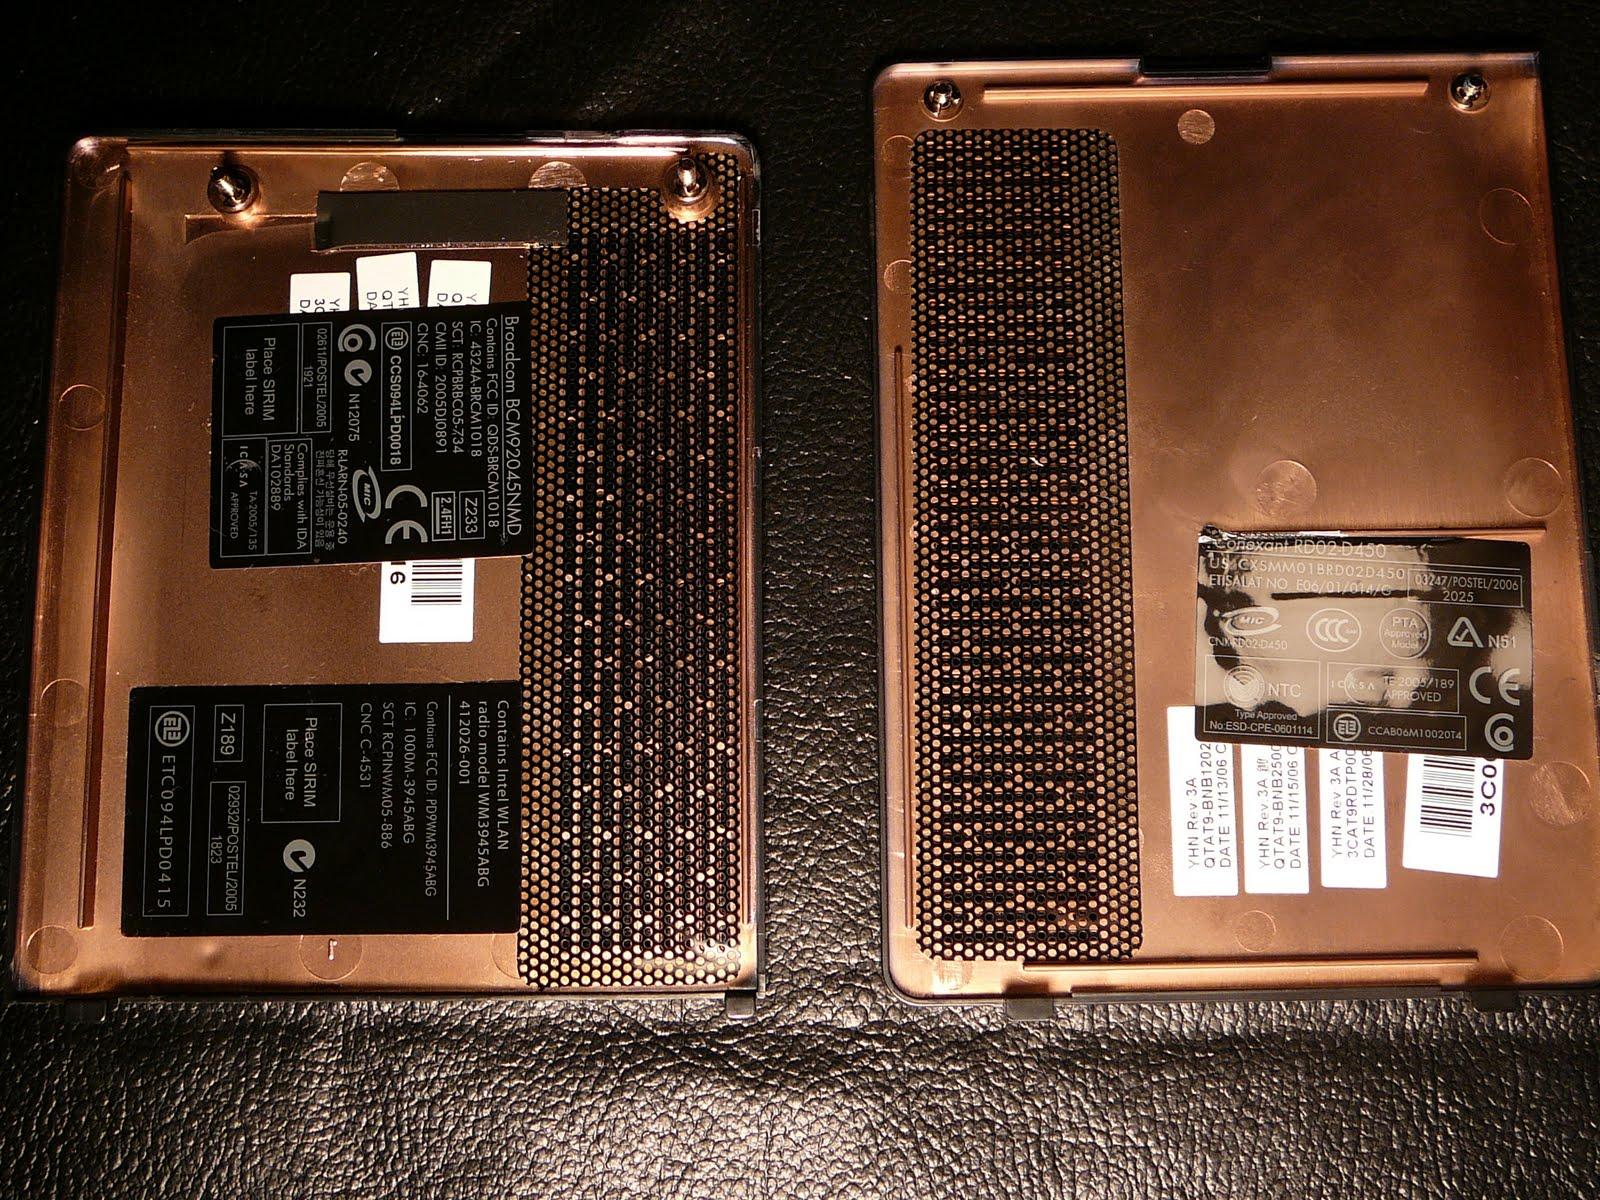 Burt's Developers Blog: How I Fixed My Overheating HP DV9000